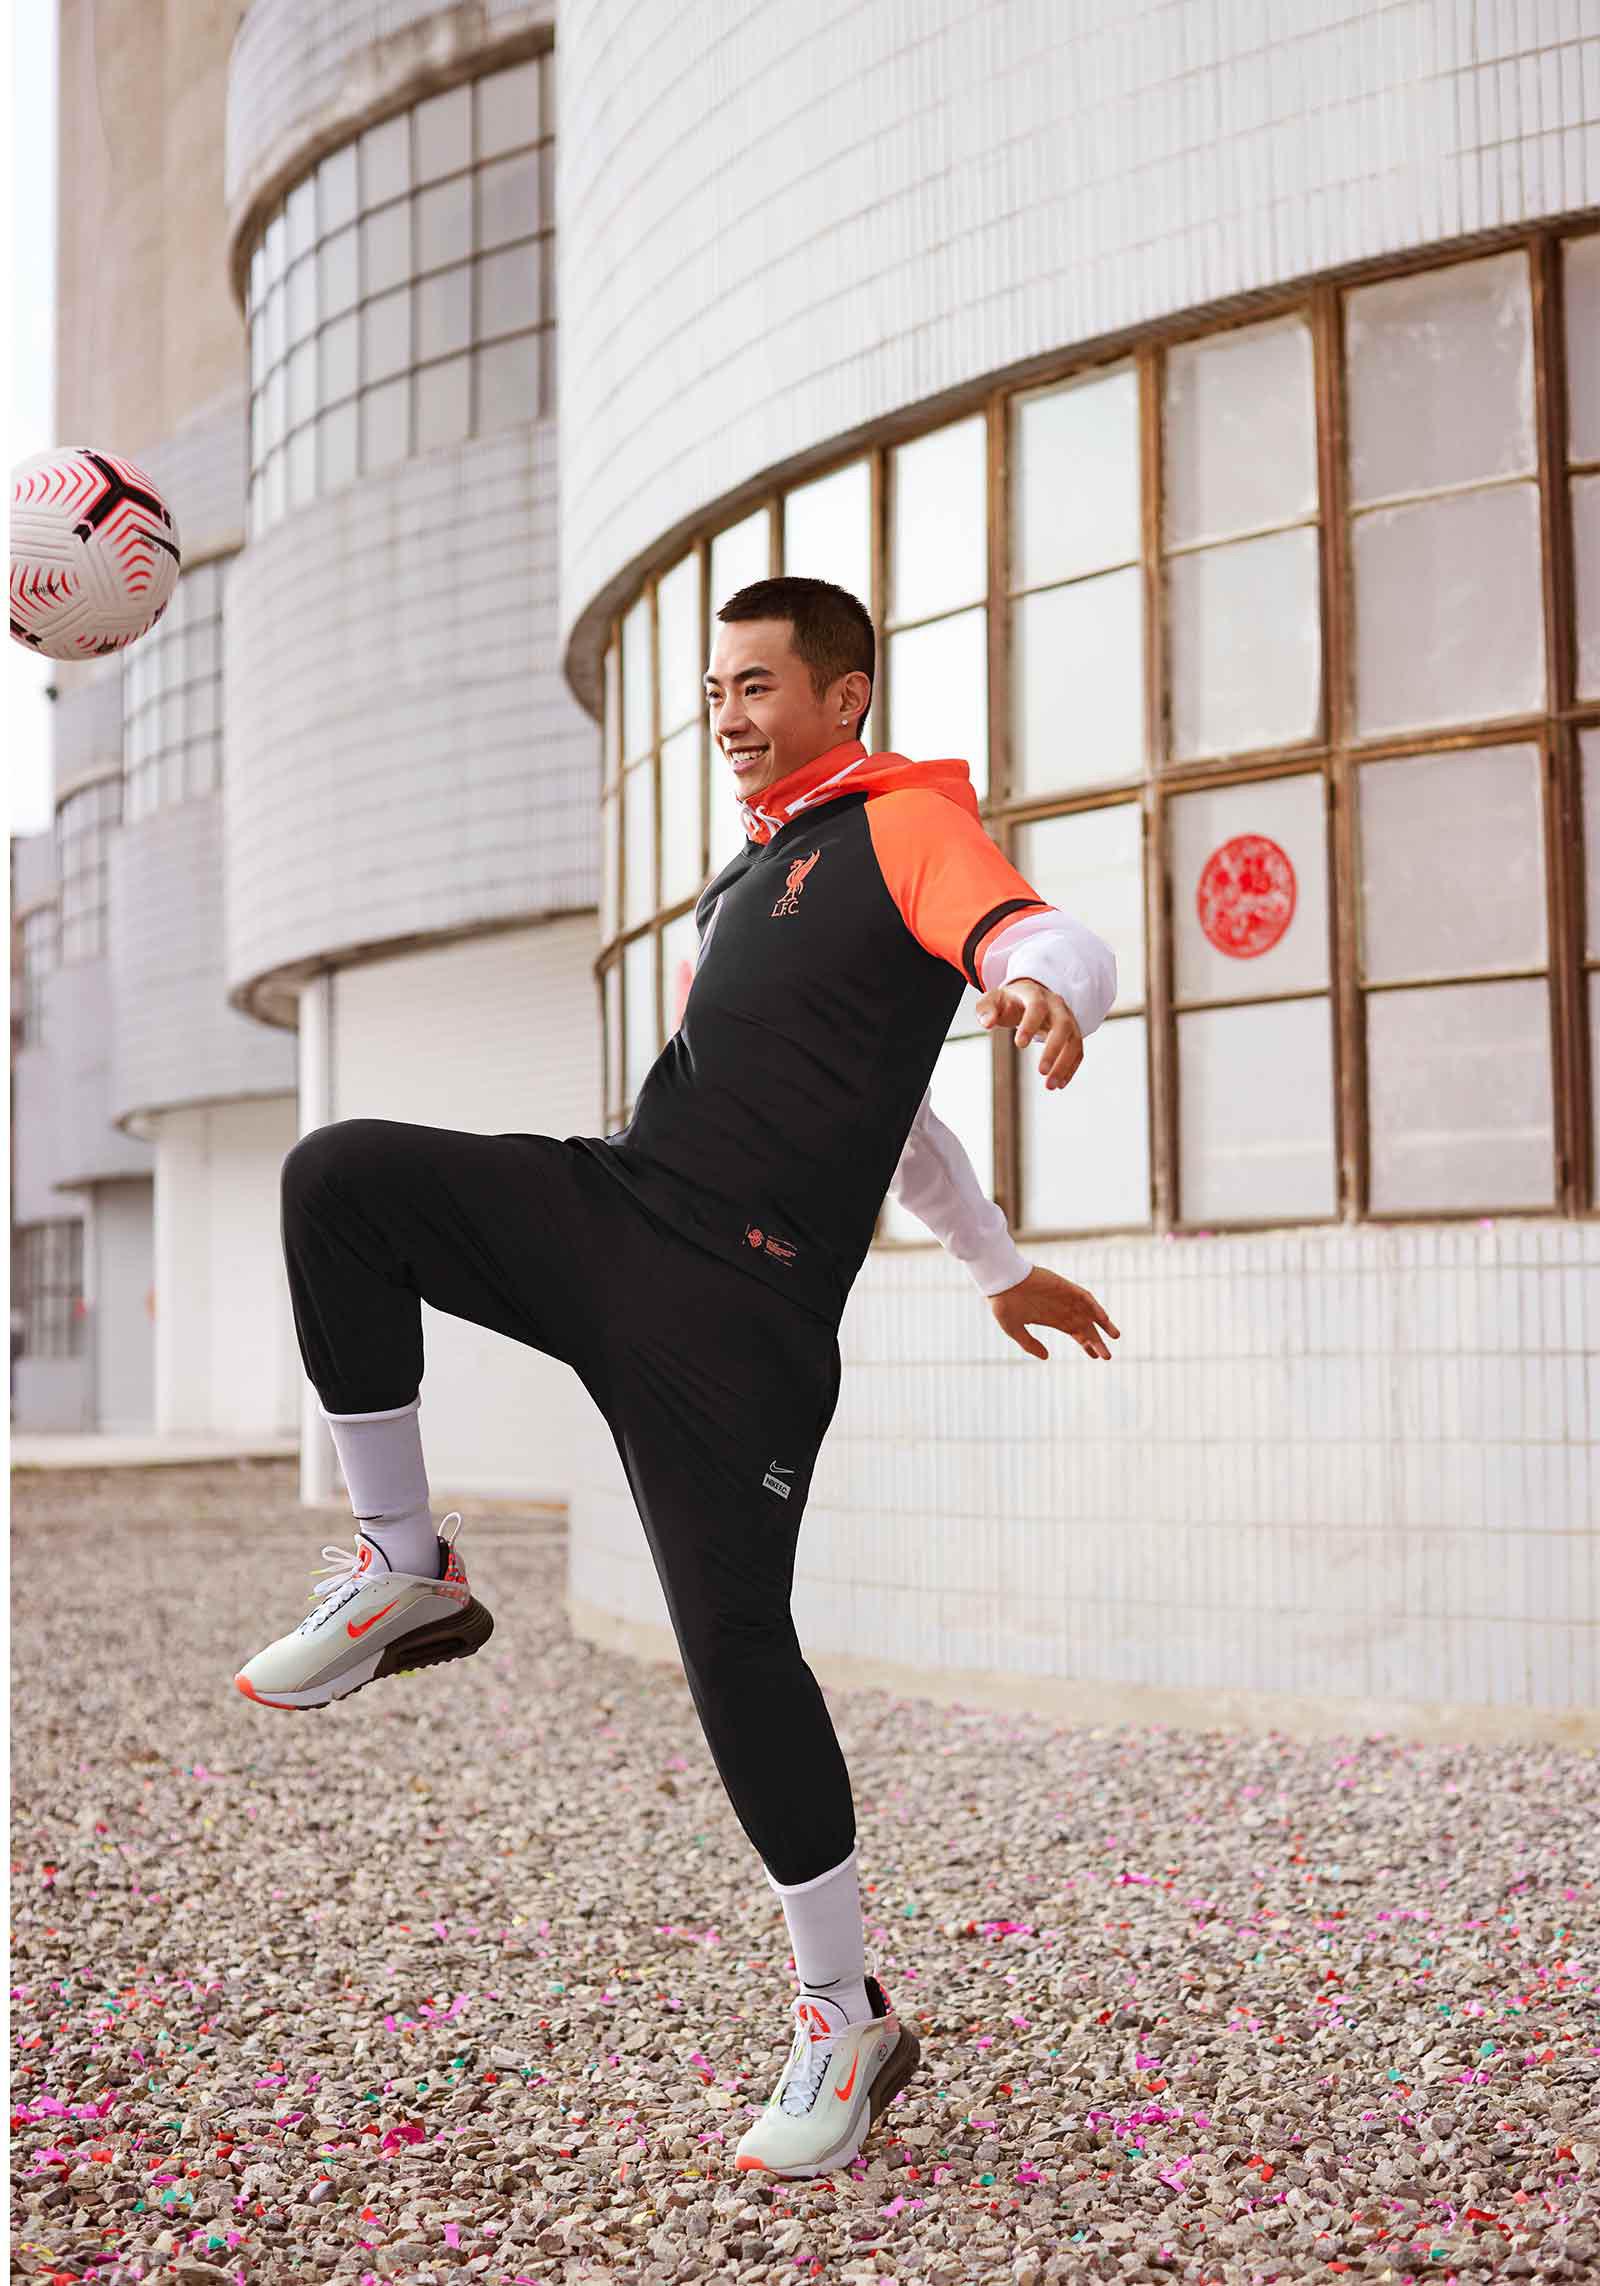 Camisa Ano Novo Chinês do Liverpool 2021 Nike